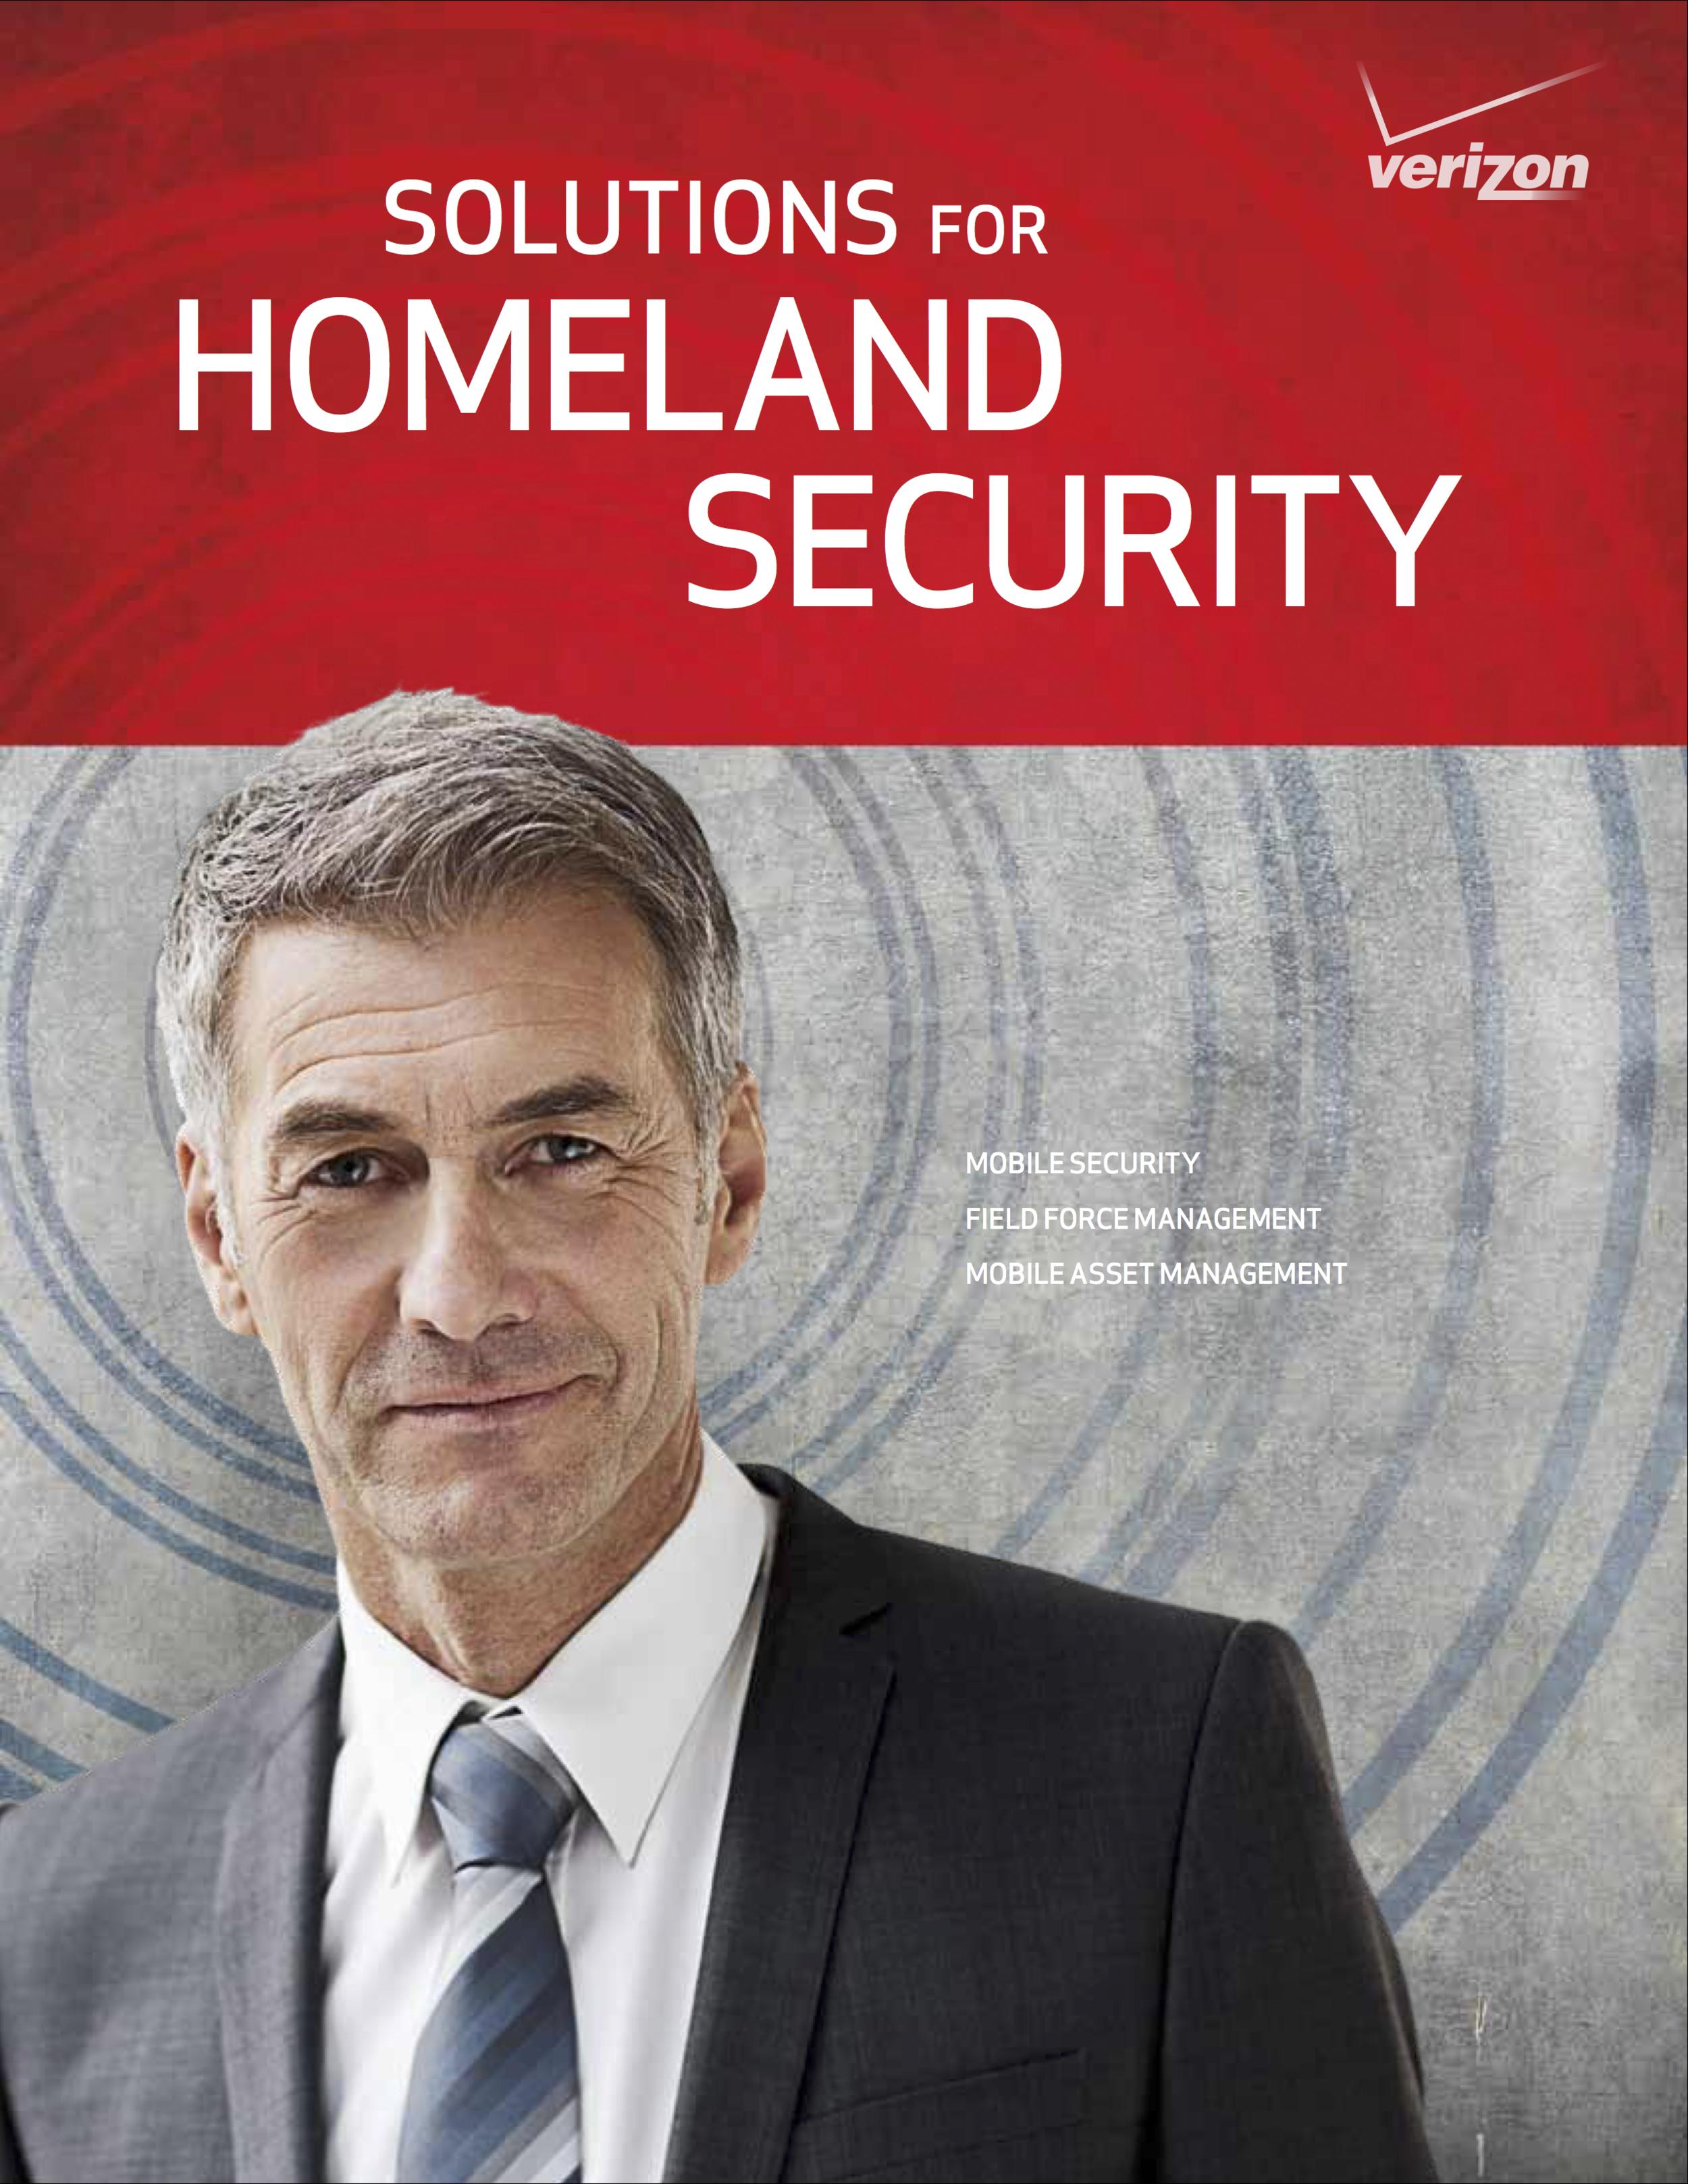 DHS brochure